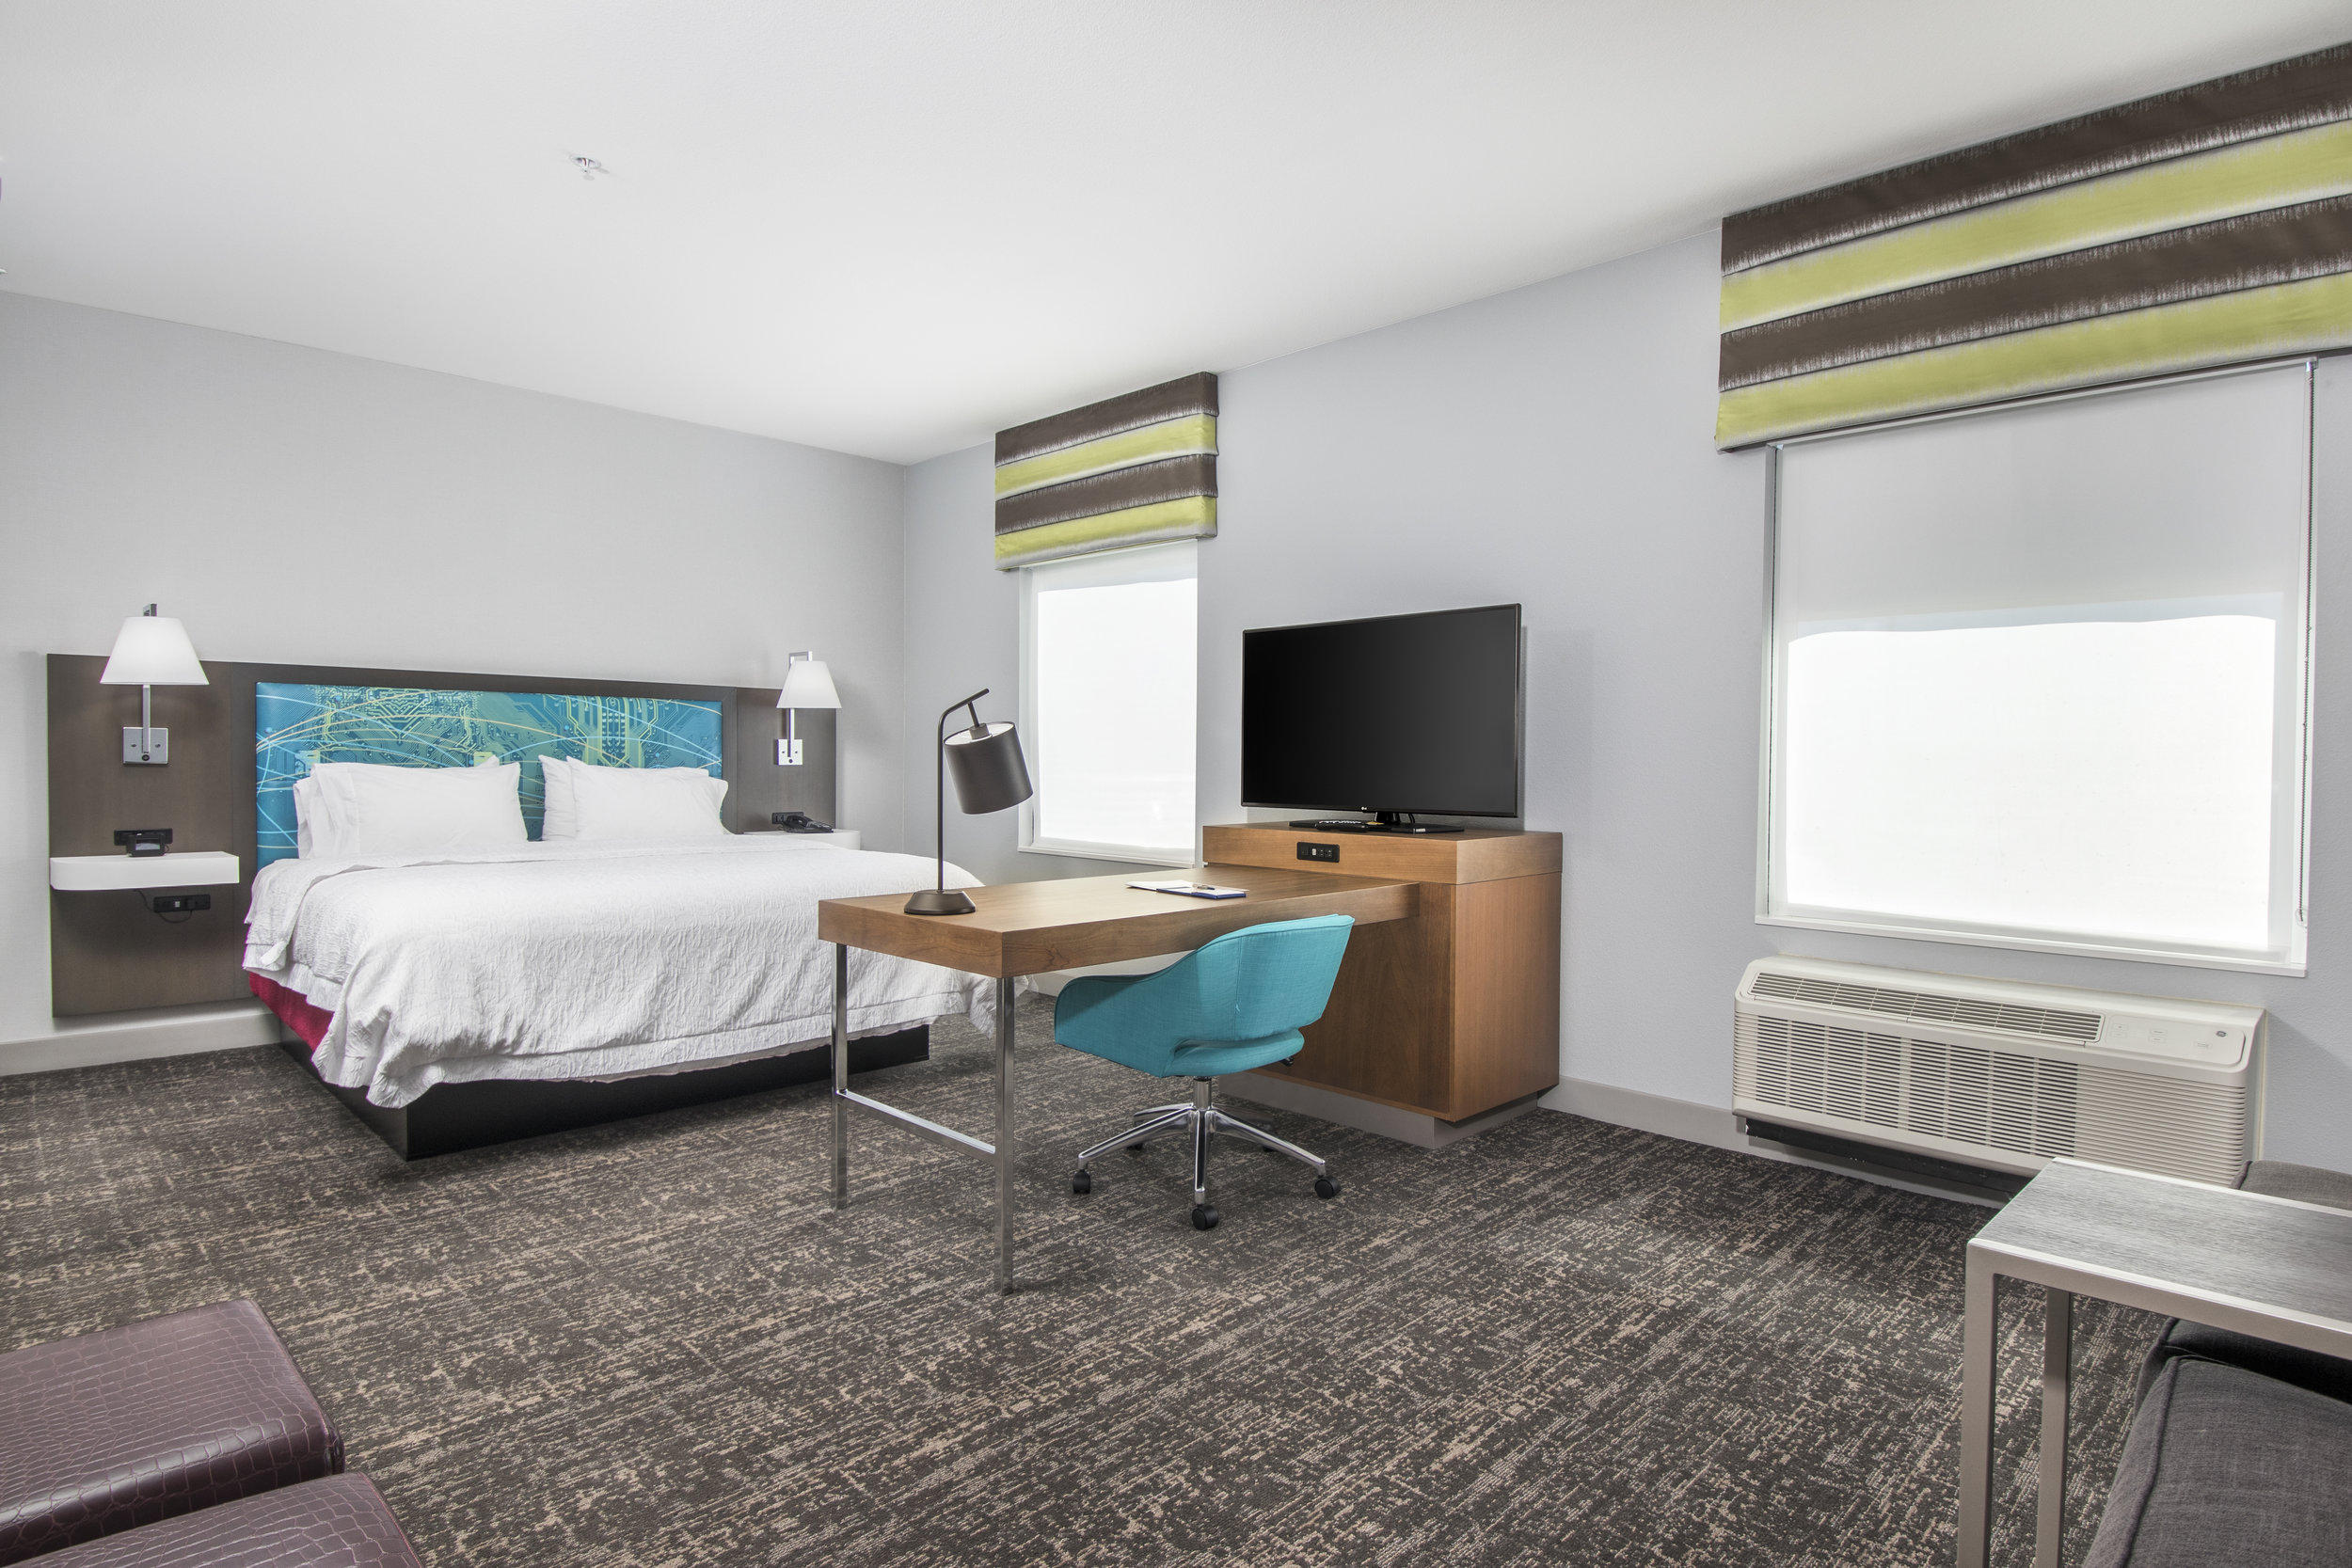 35_Hampton Inn Guest Room1.jpg